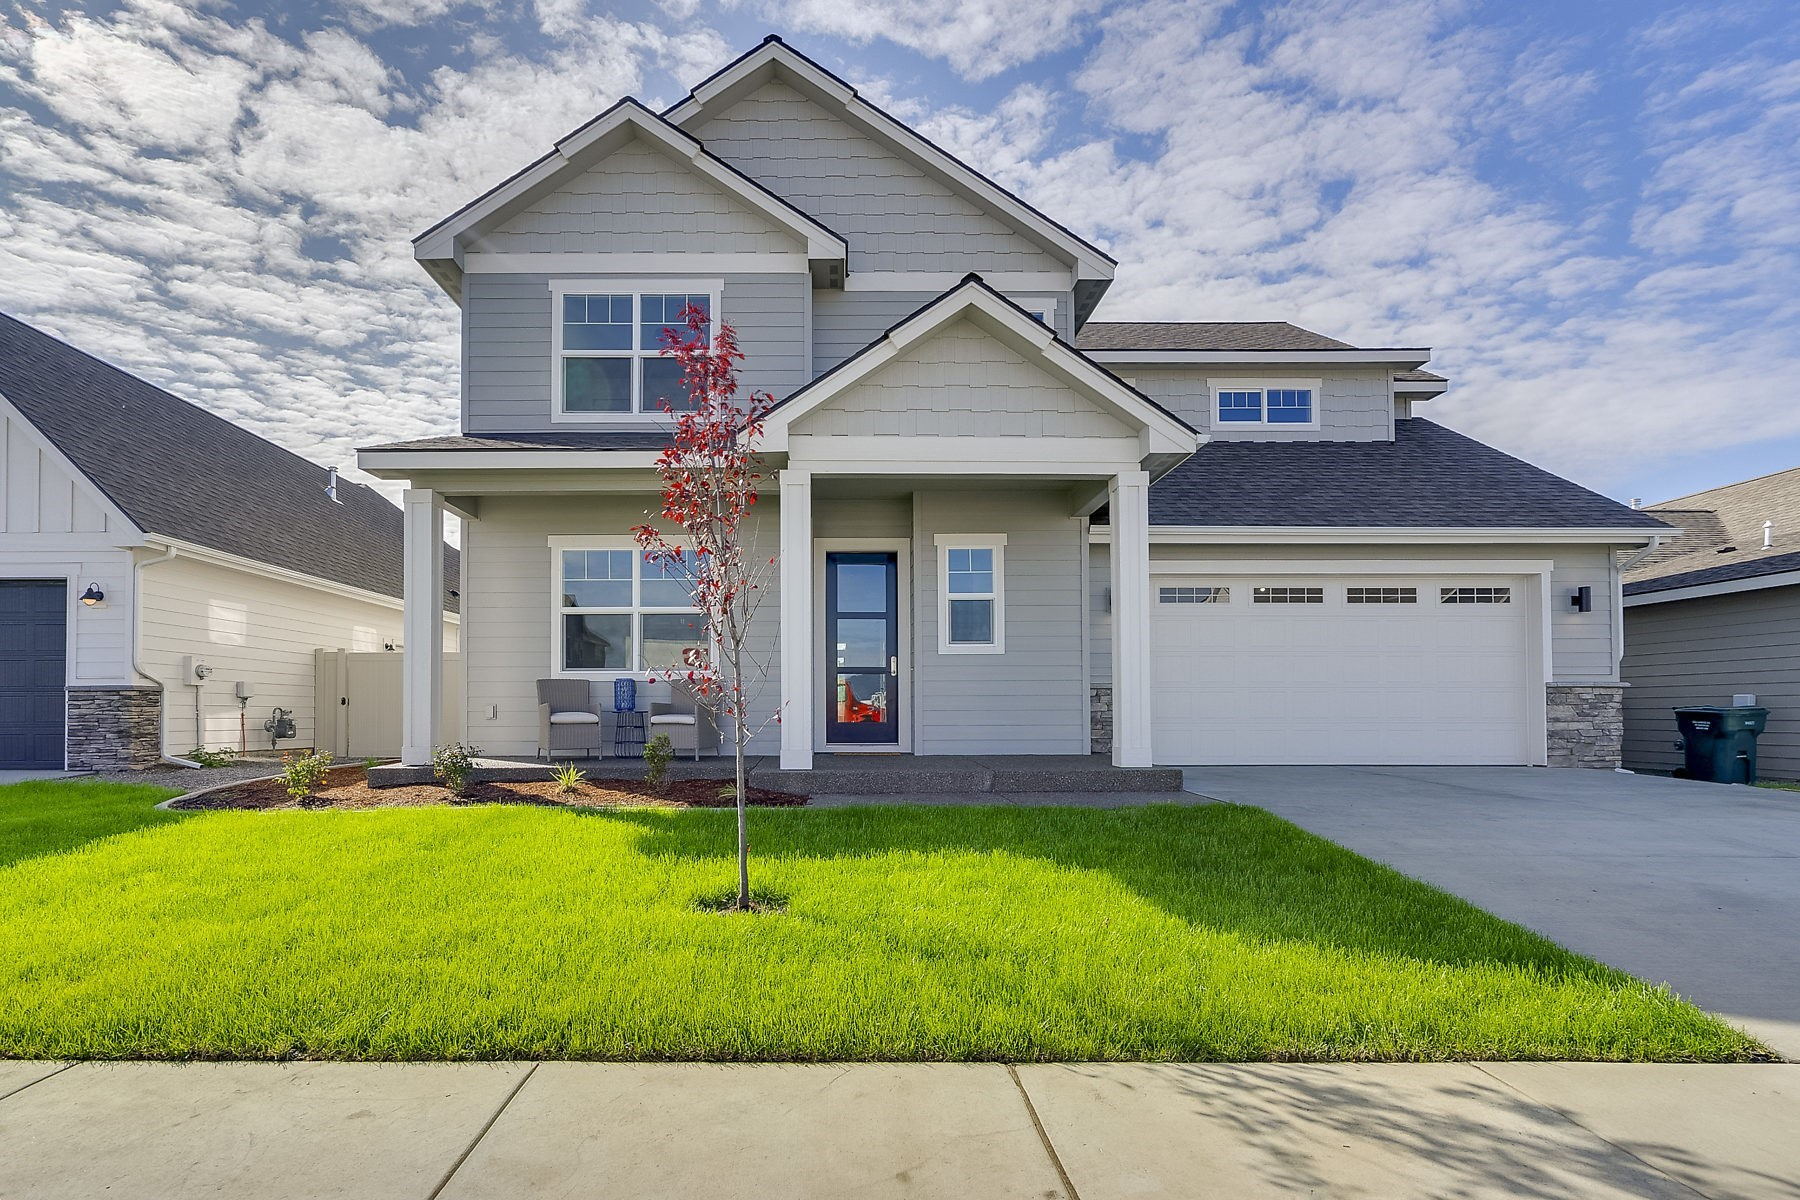 Single Family Homes for Sale at 2908 N Cyprus Fox Lp Post Falls, Idaho 83854 United States